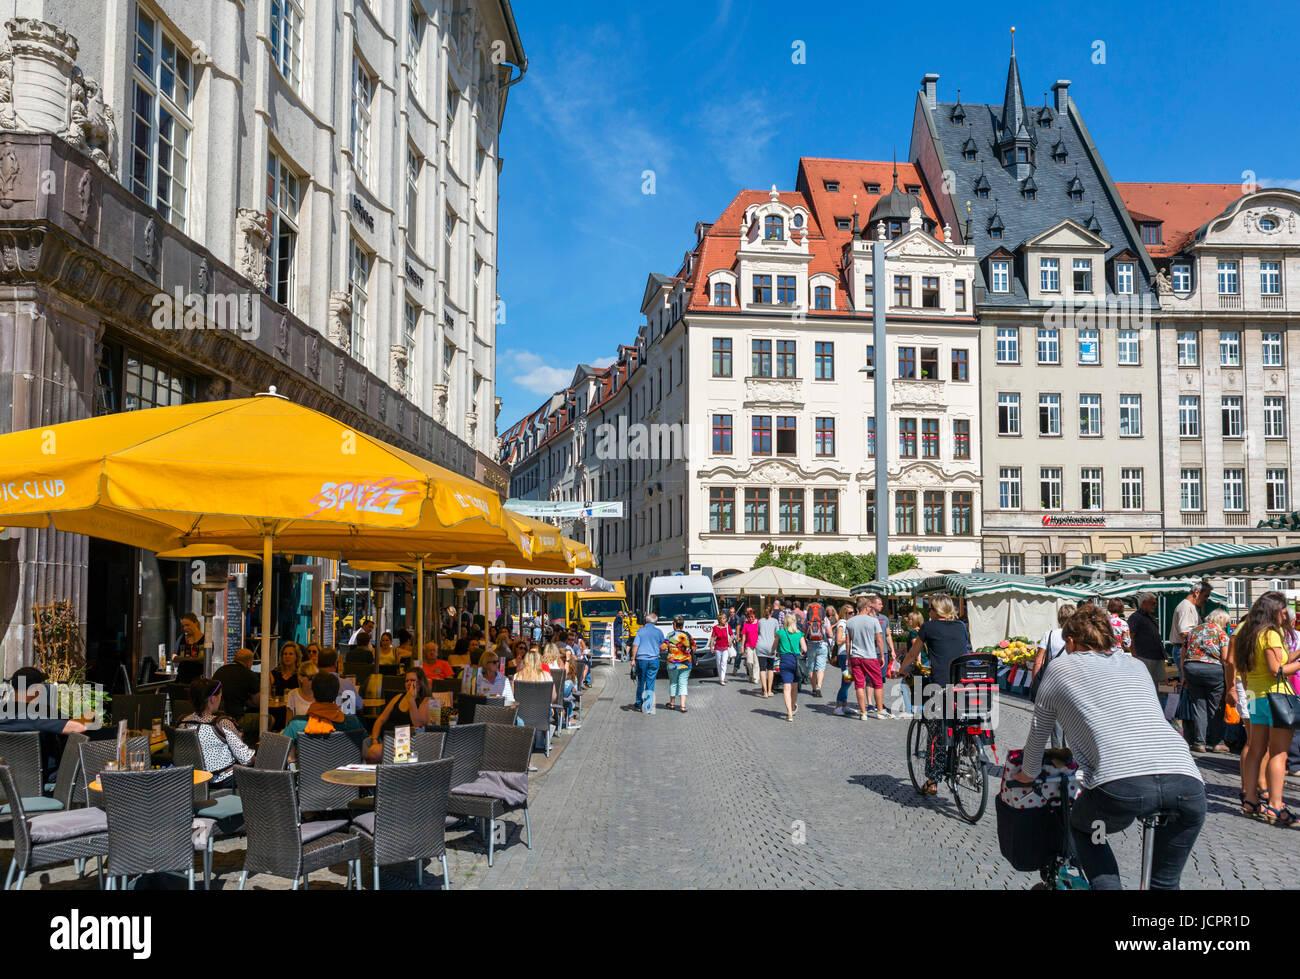 Sidewalk cafe in the Markt (Market Square), Leipzig, Saxony, Germany - Stock Image